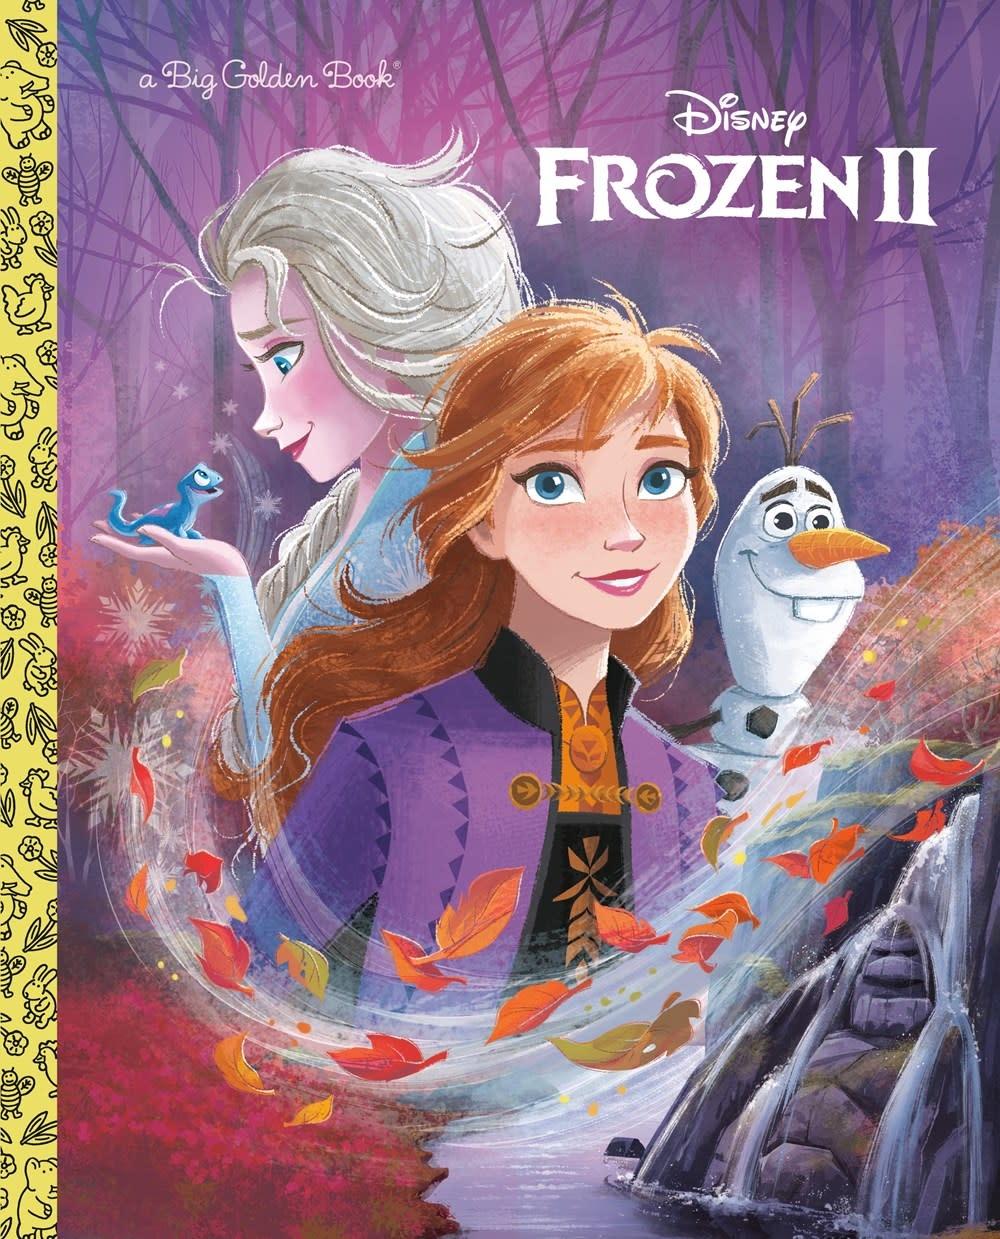 Golden/Disney Disney Frozen 2 (Big Golden Book)